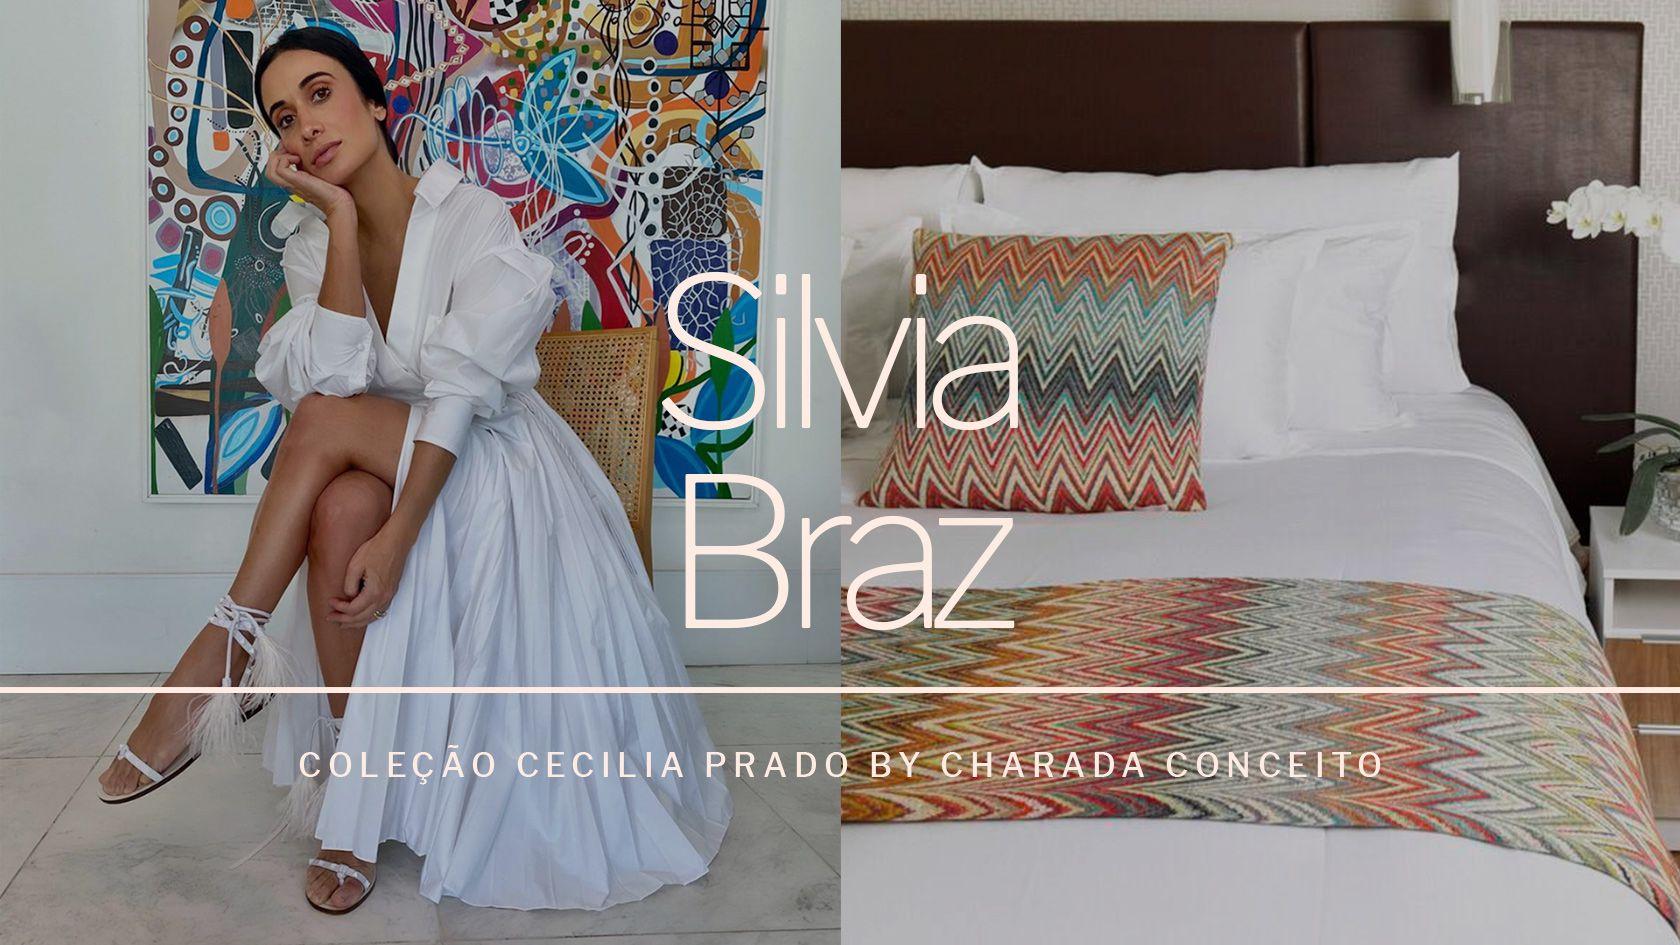 Banner Silvia Braz